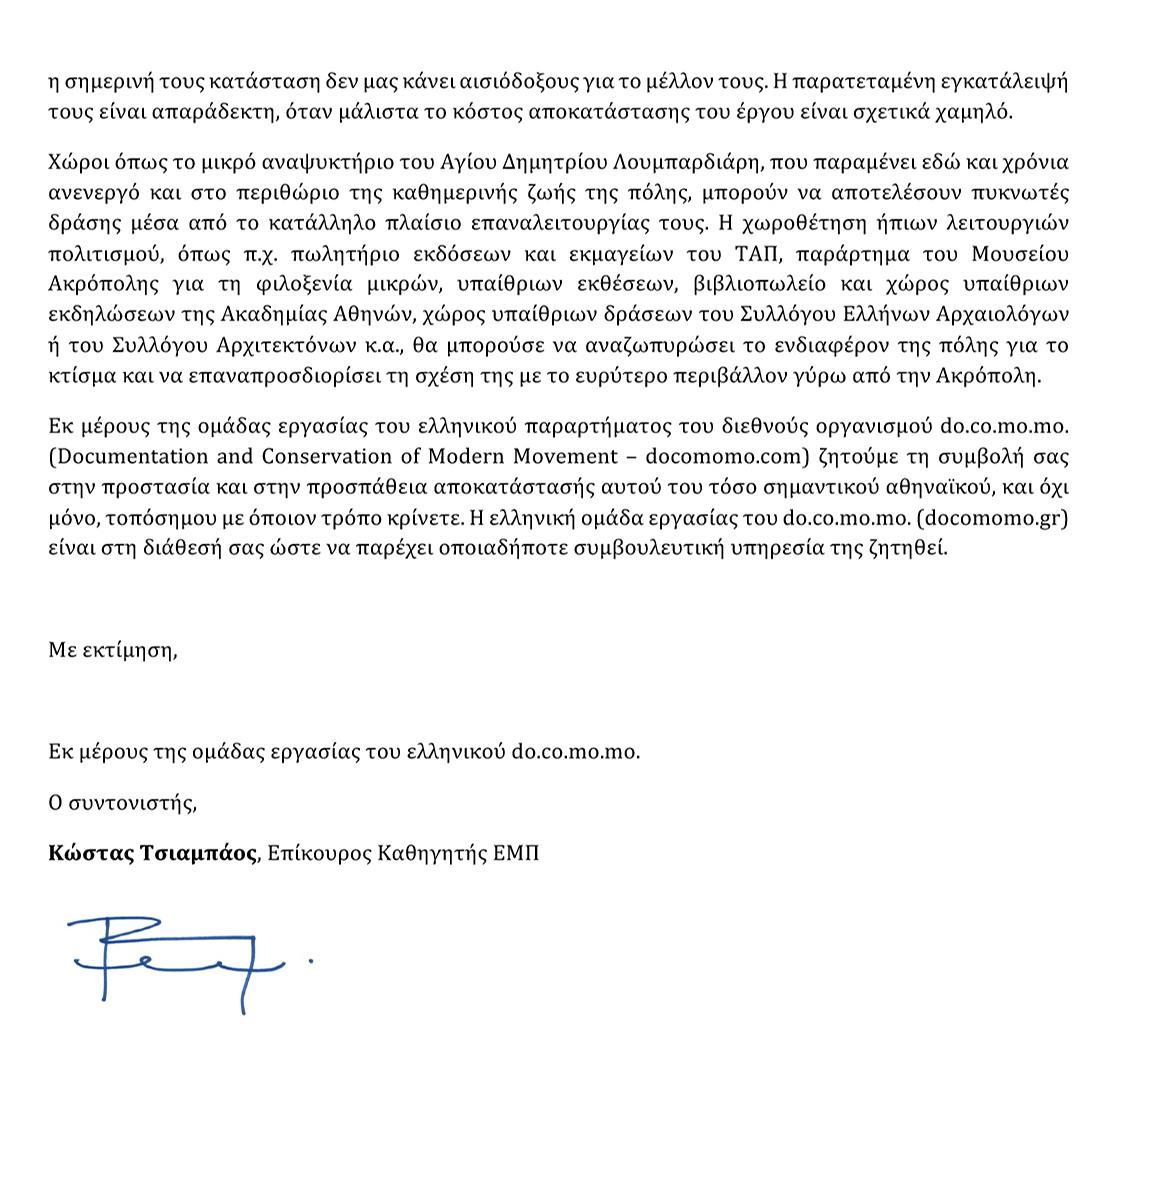 Microsoft Word - docomomoGreece_PikionisPetition2018.docx